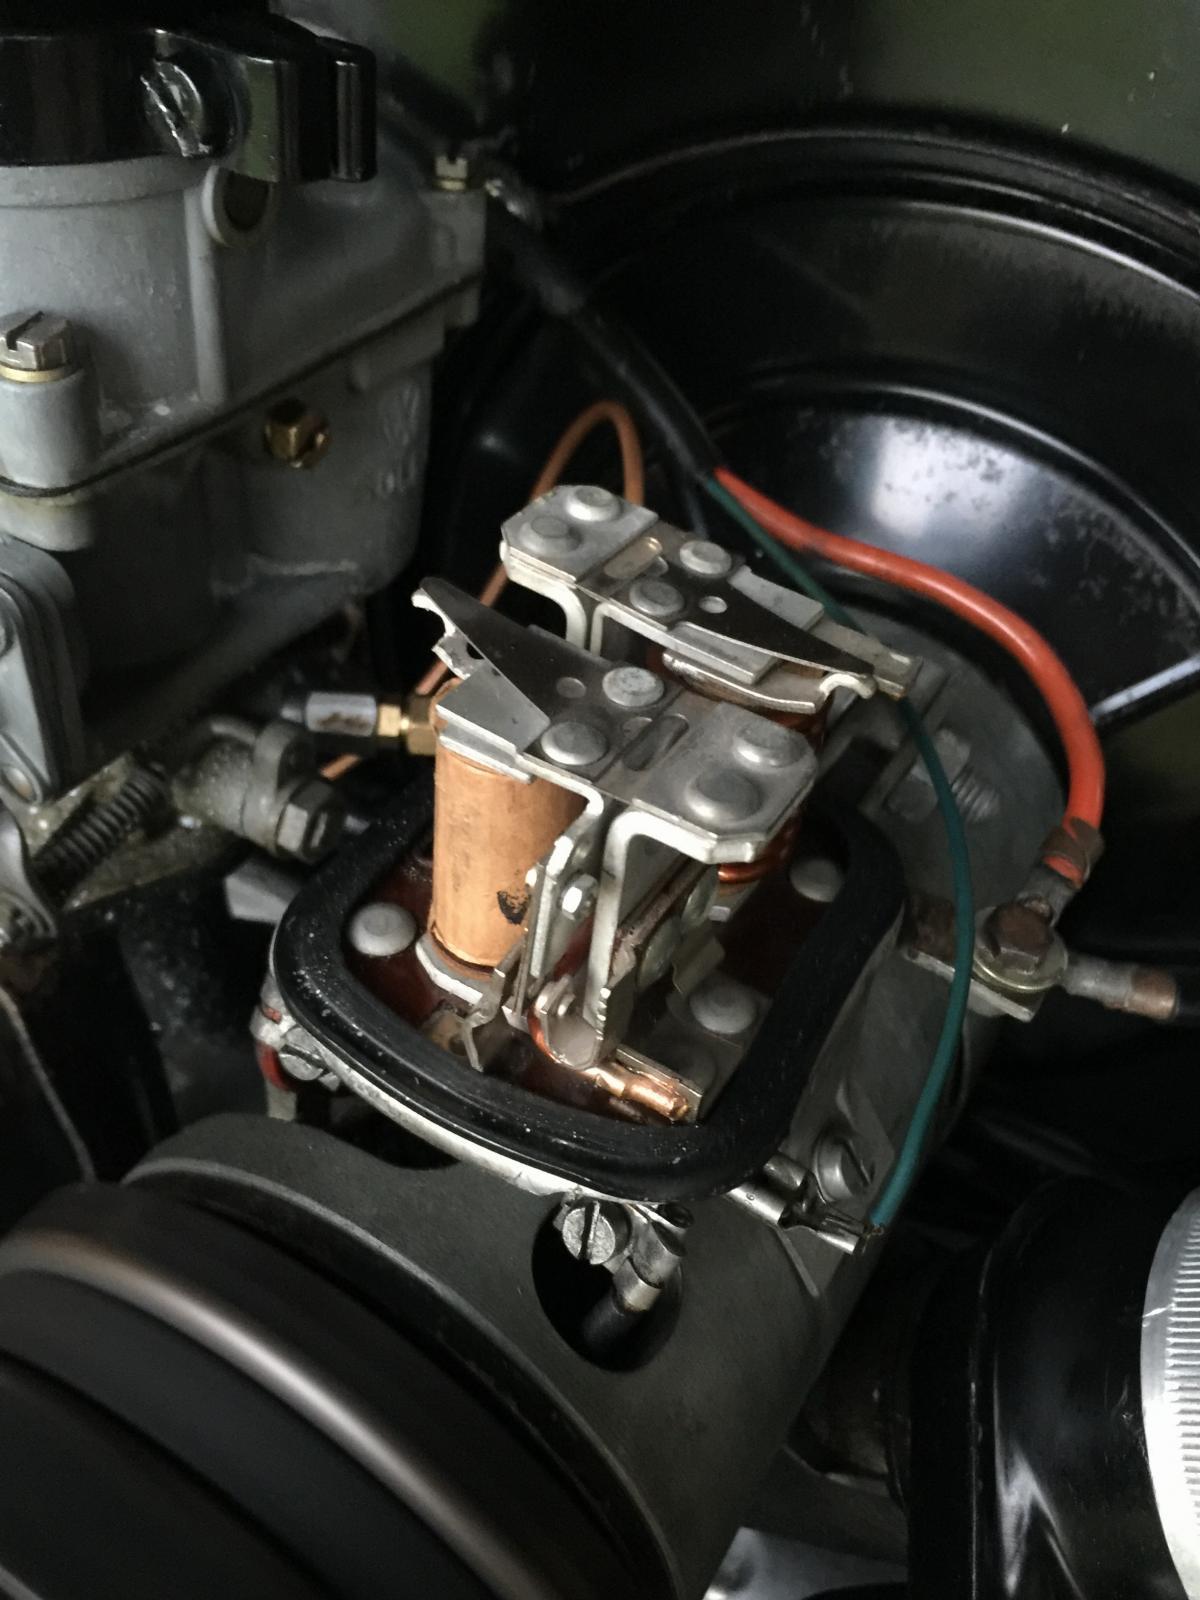 TheSamba.com :: Beetle - 1958-1967 - View topic - Solid state 6 volt  regulatorTheSamba.com